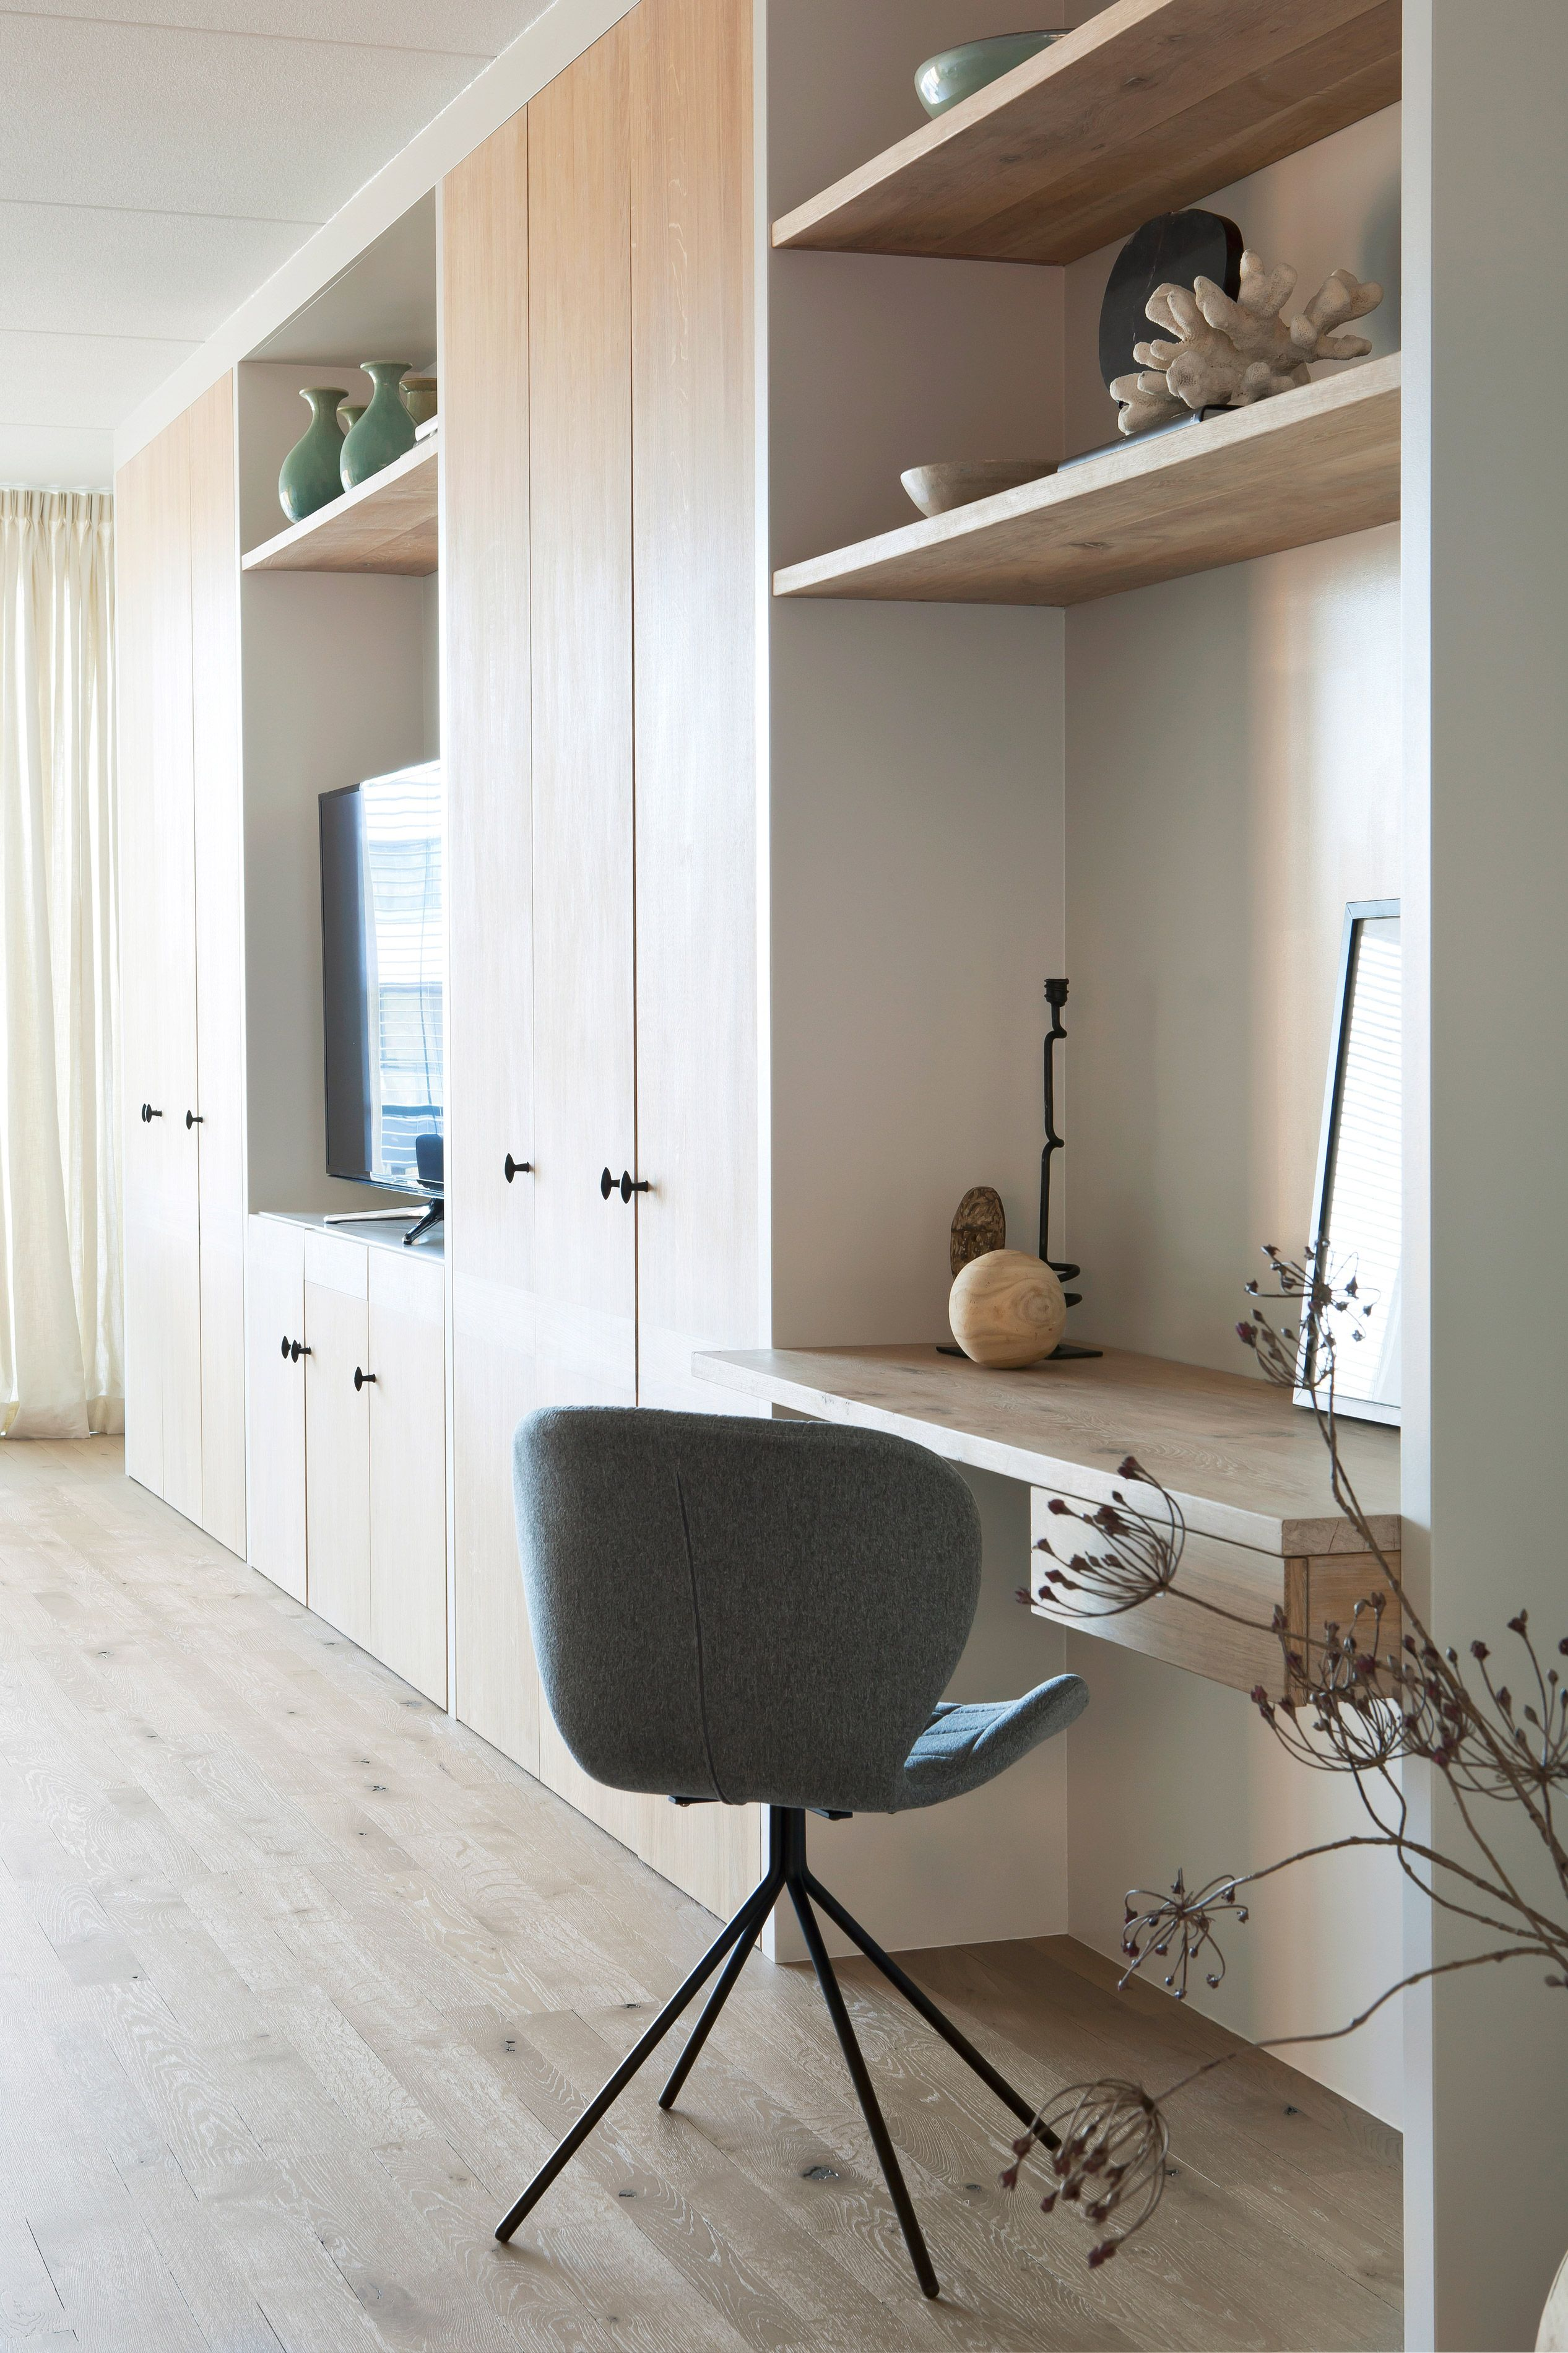 woonkamer inspiratie werkplek in woonkamer kastenwand foto anneke gambon stijlvol wonen. Black Bedroom Furniture Sets. Home Design Ideas